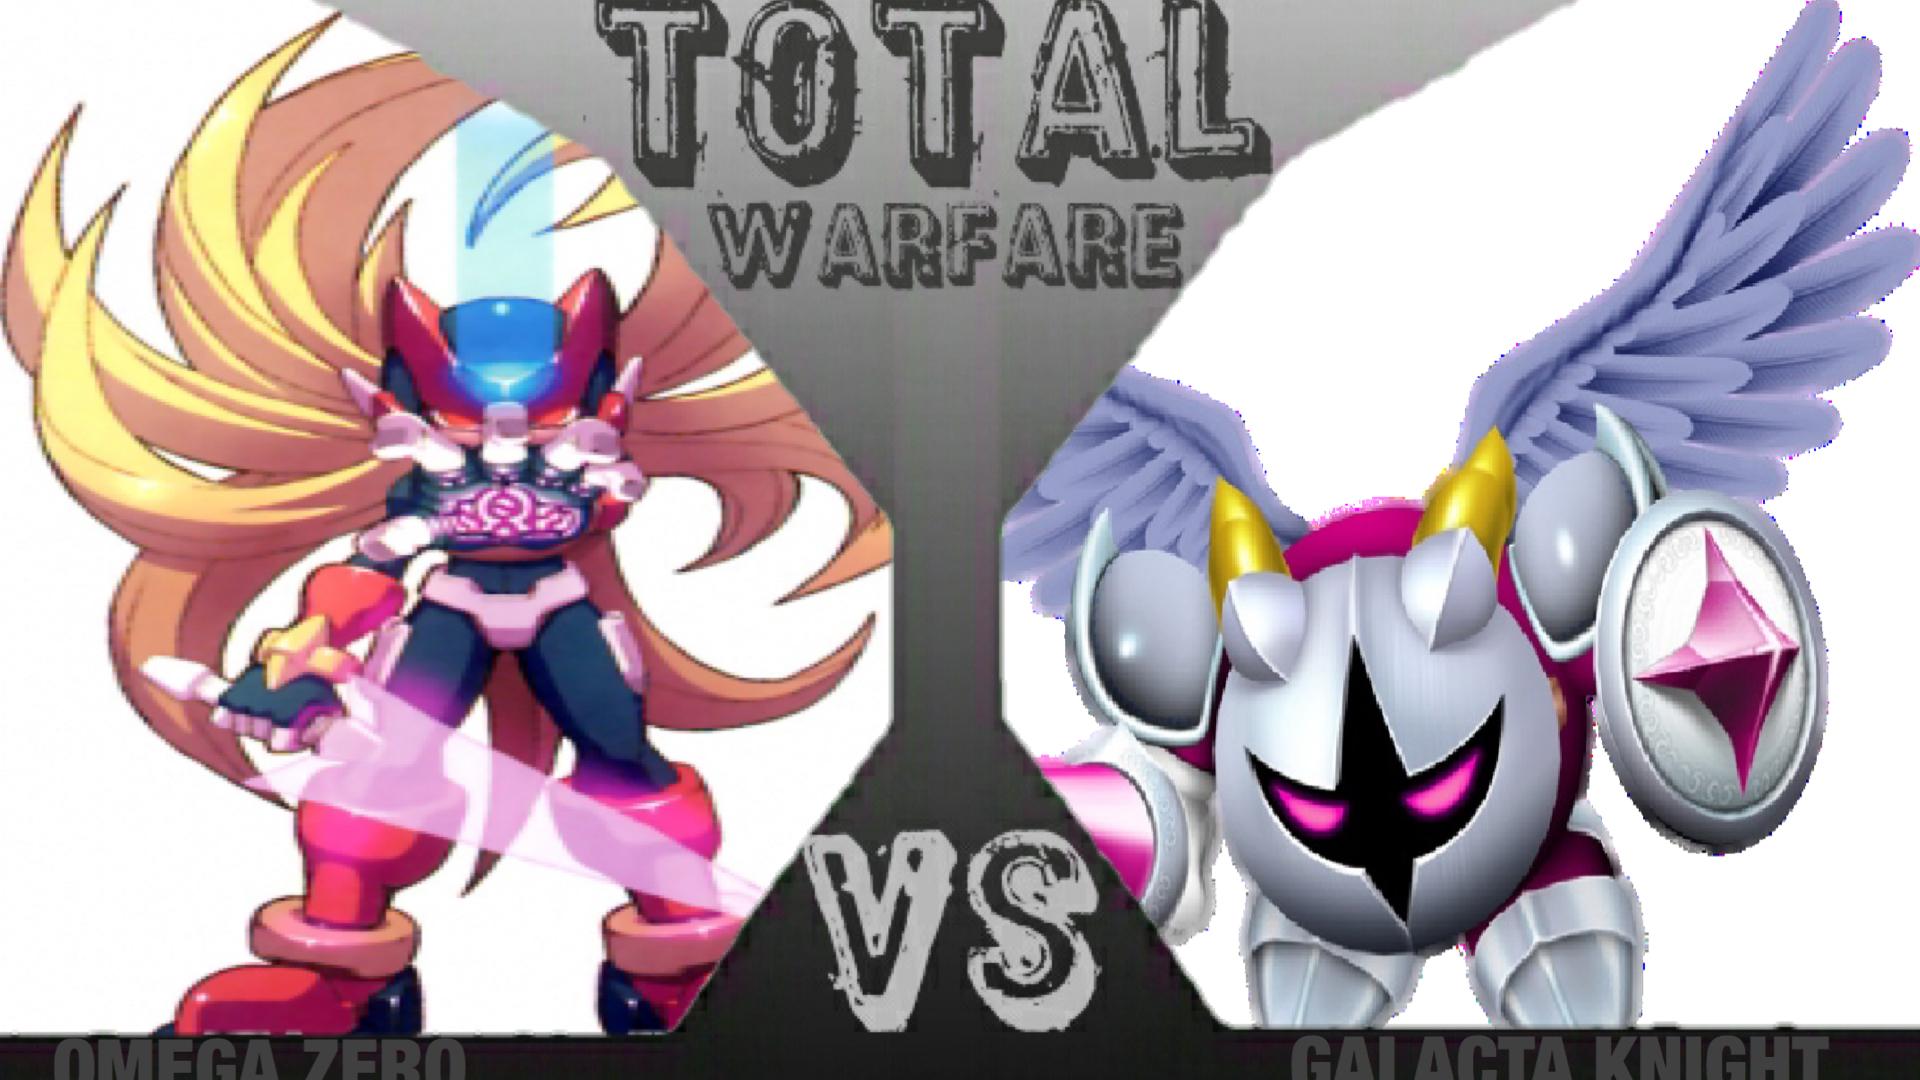 image omega zero vs galacta knight jpeg total warfare fanon